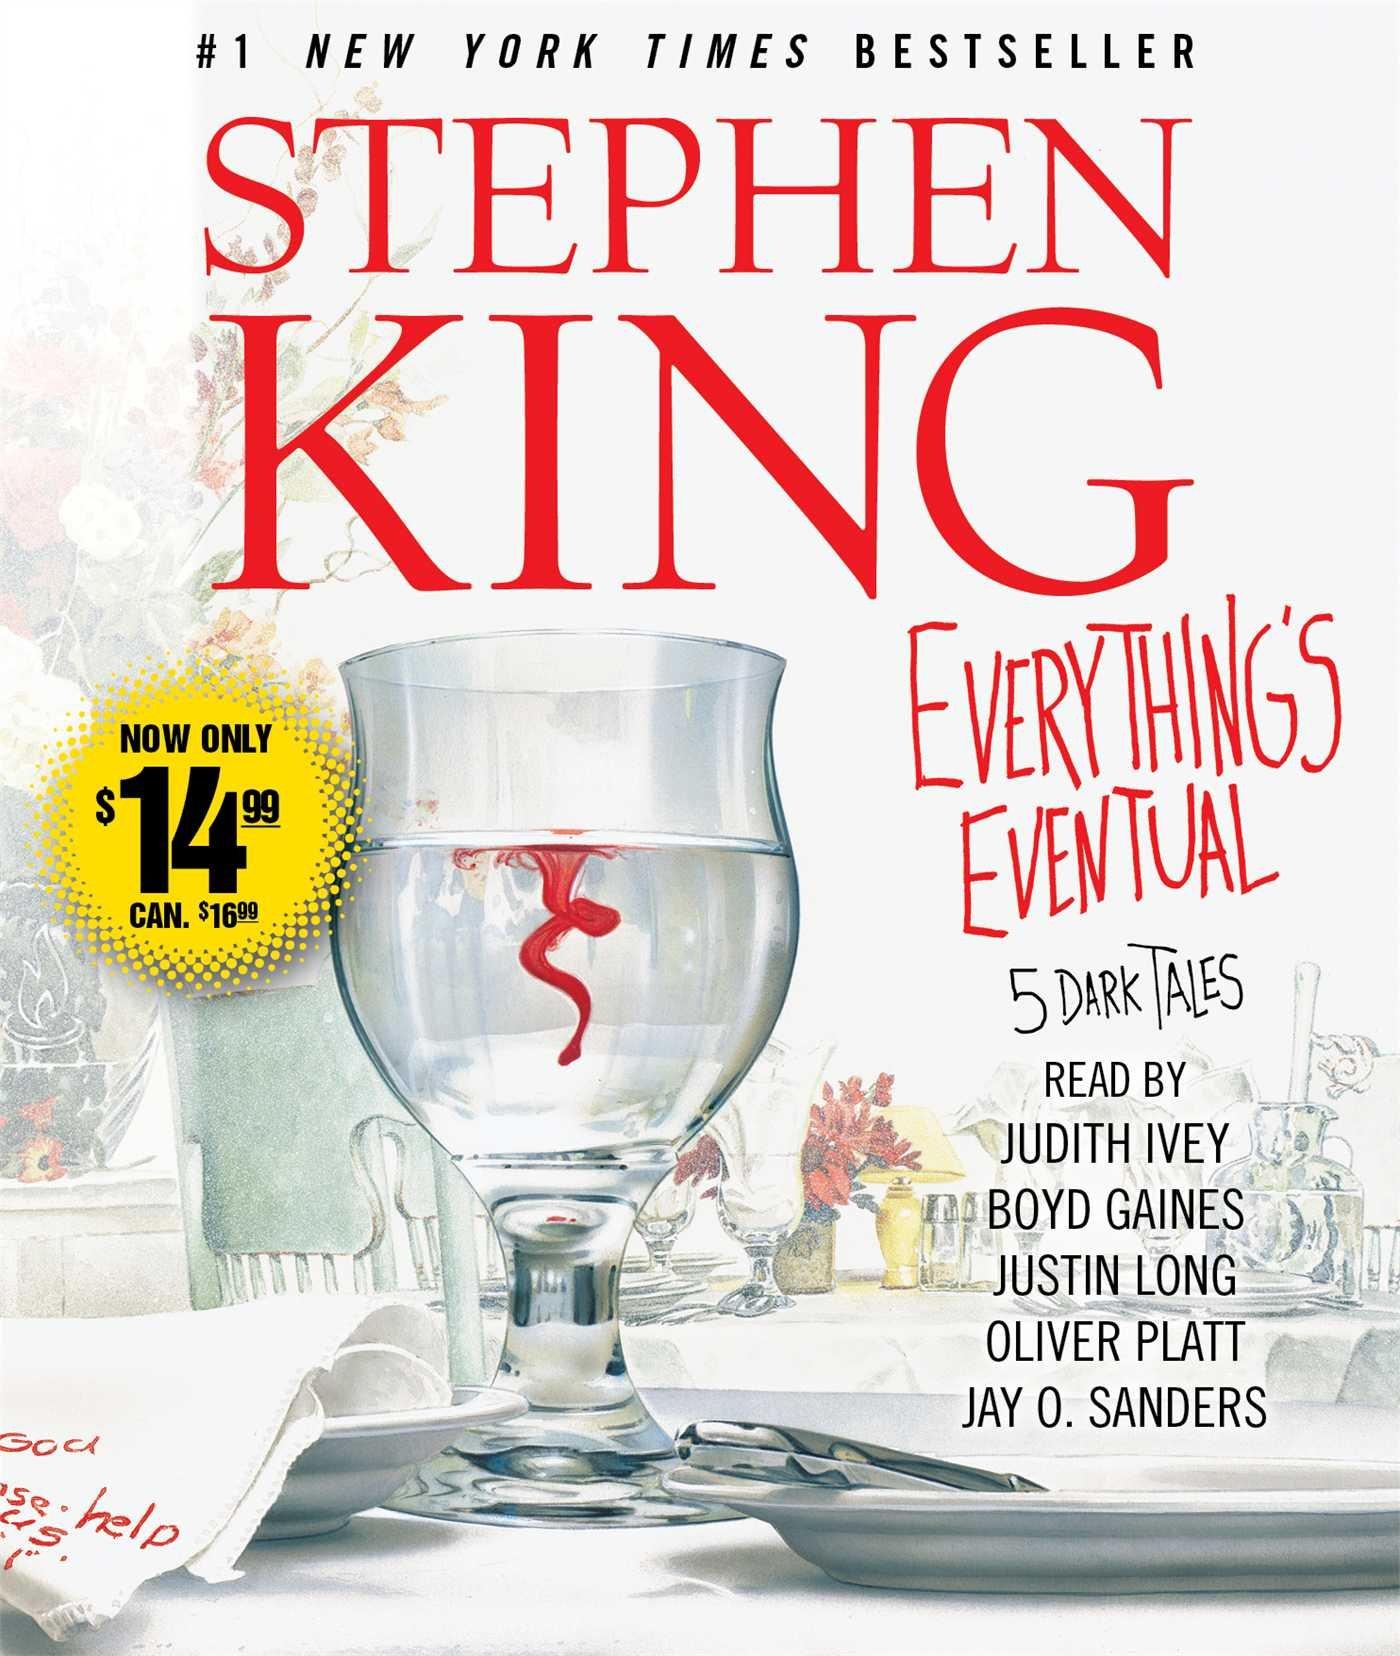 Everything's Eventual: Five Dark Tales pdf epub